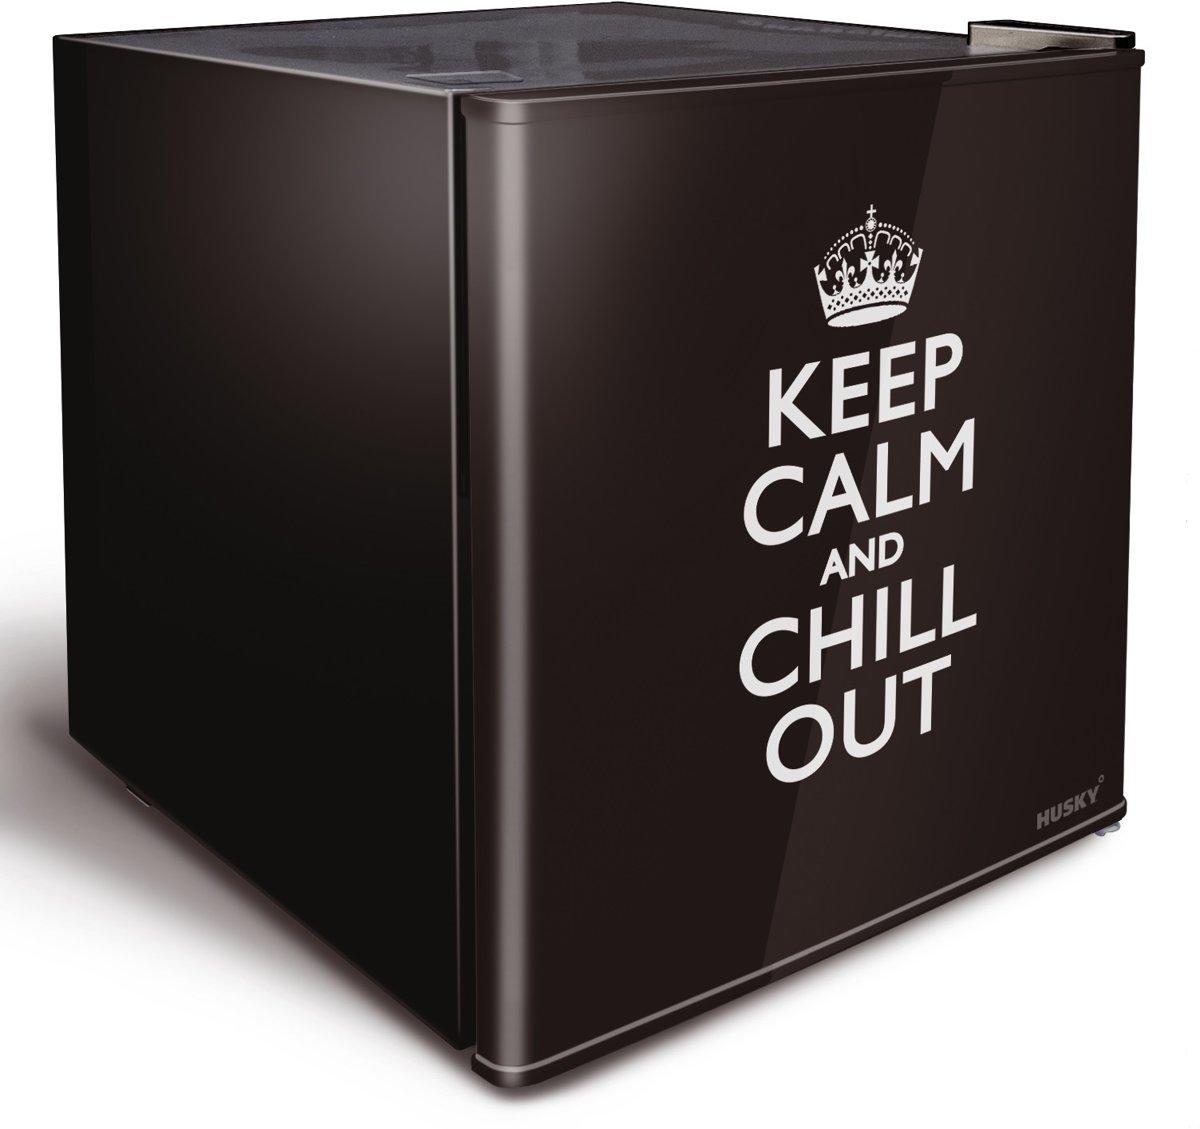 Husky KK50-KEEPCALM - Mini koelkast kopen